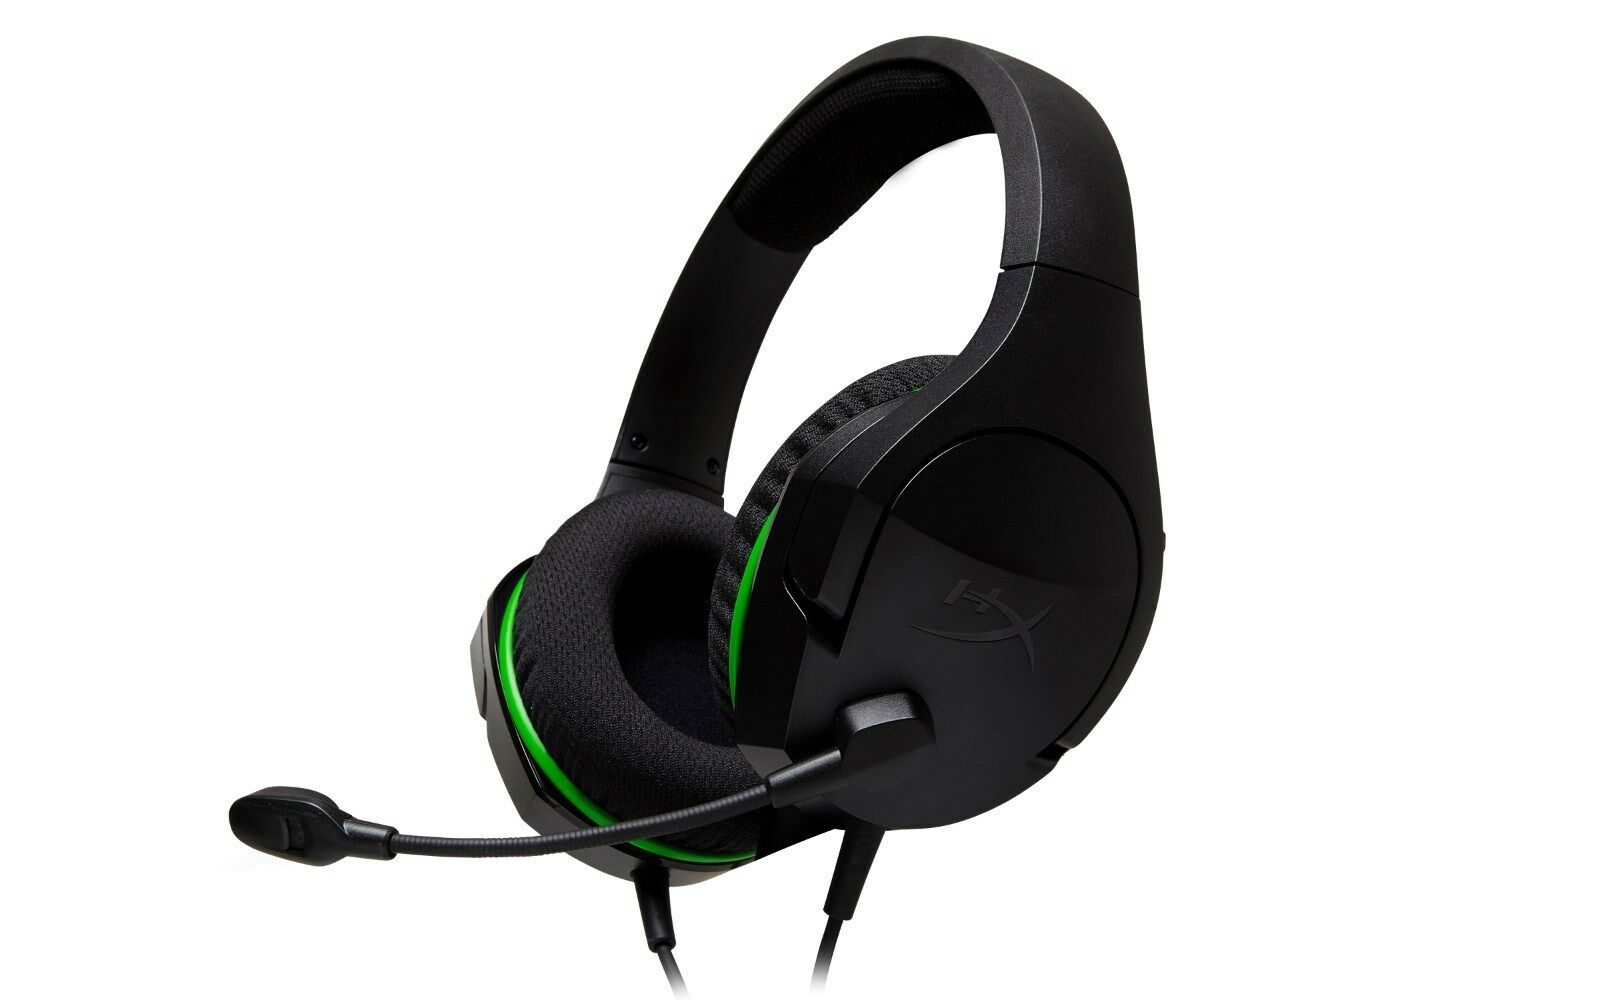 Игровые наушники HyperX CloudX Stinger Core Gaming Headset - Xbox - Black